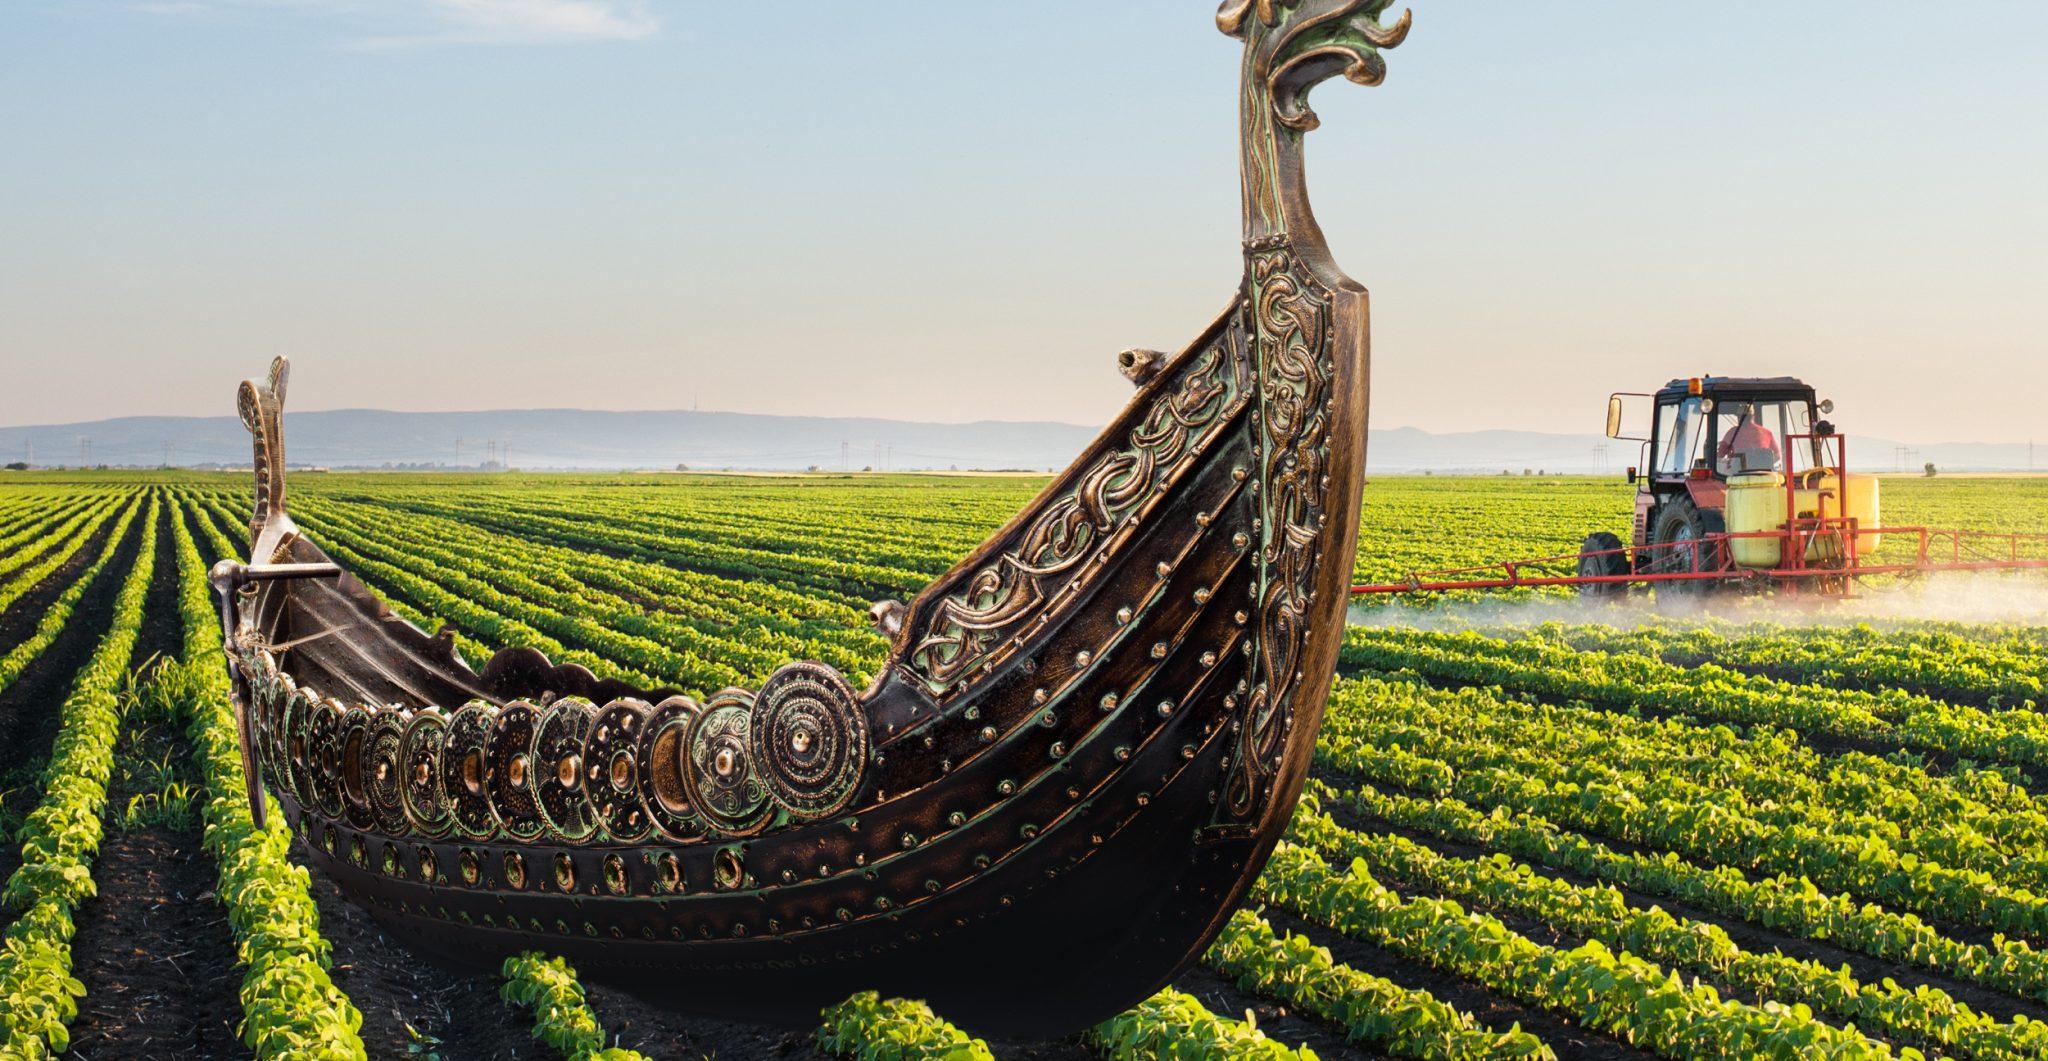 Viking ship in a farm